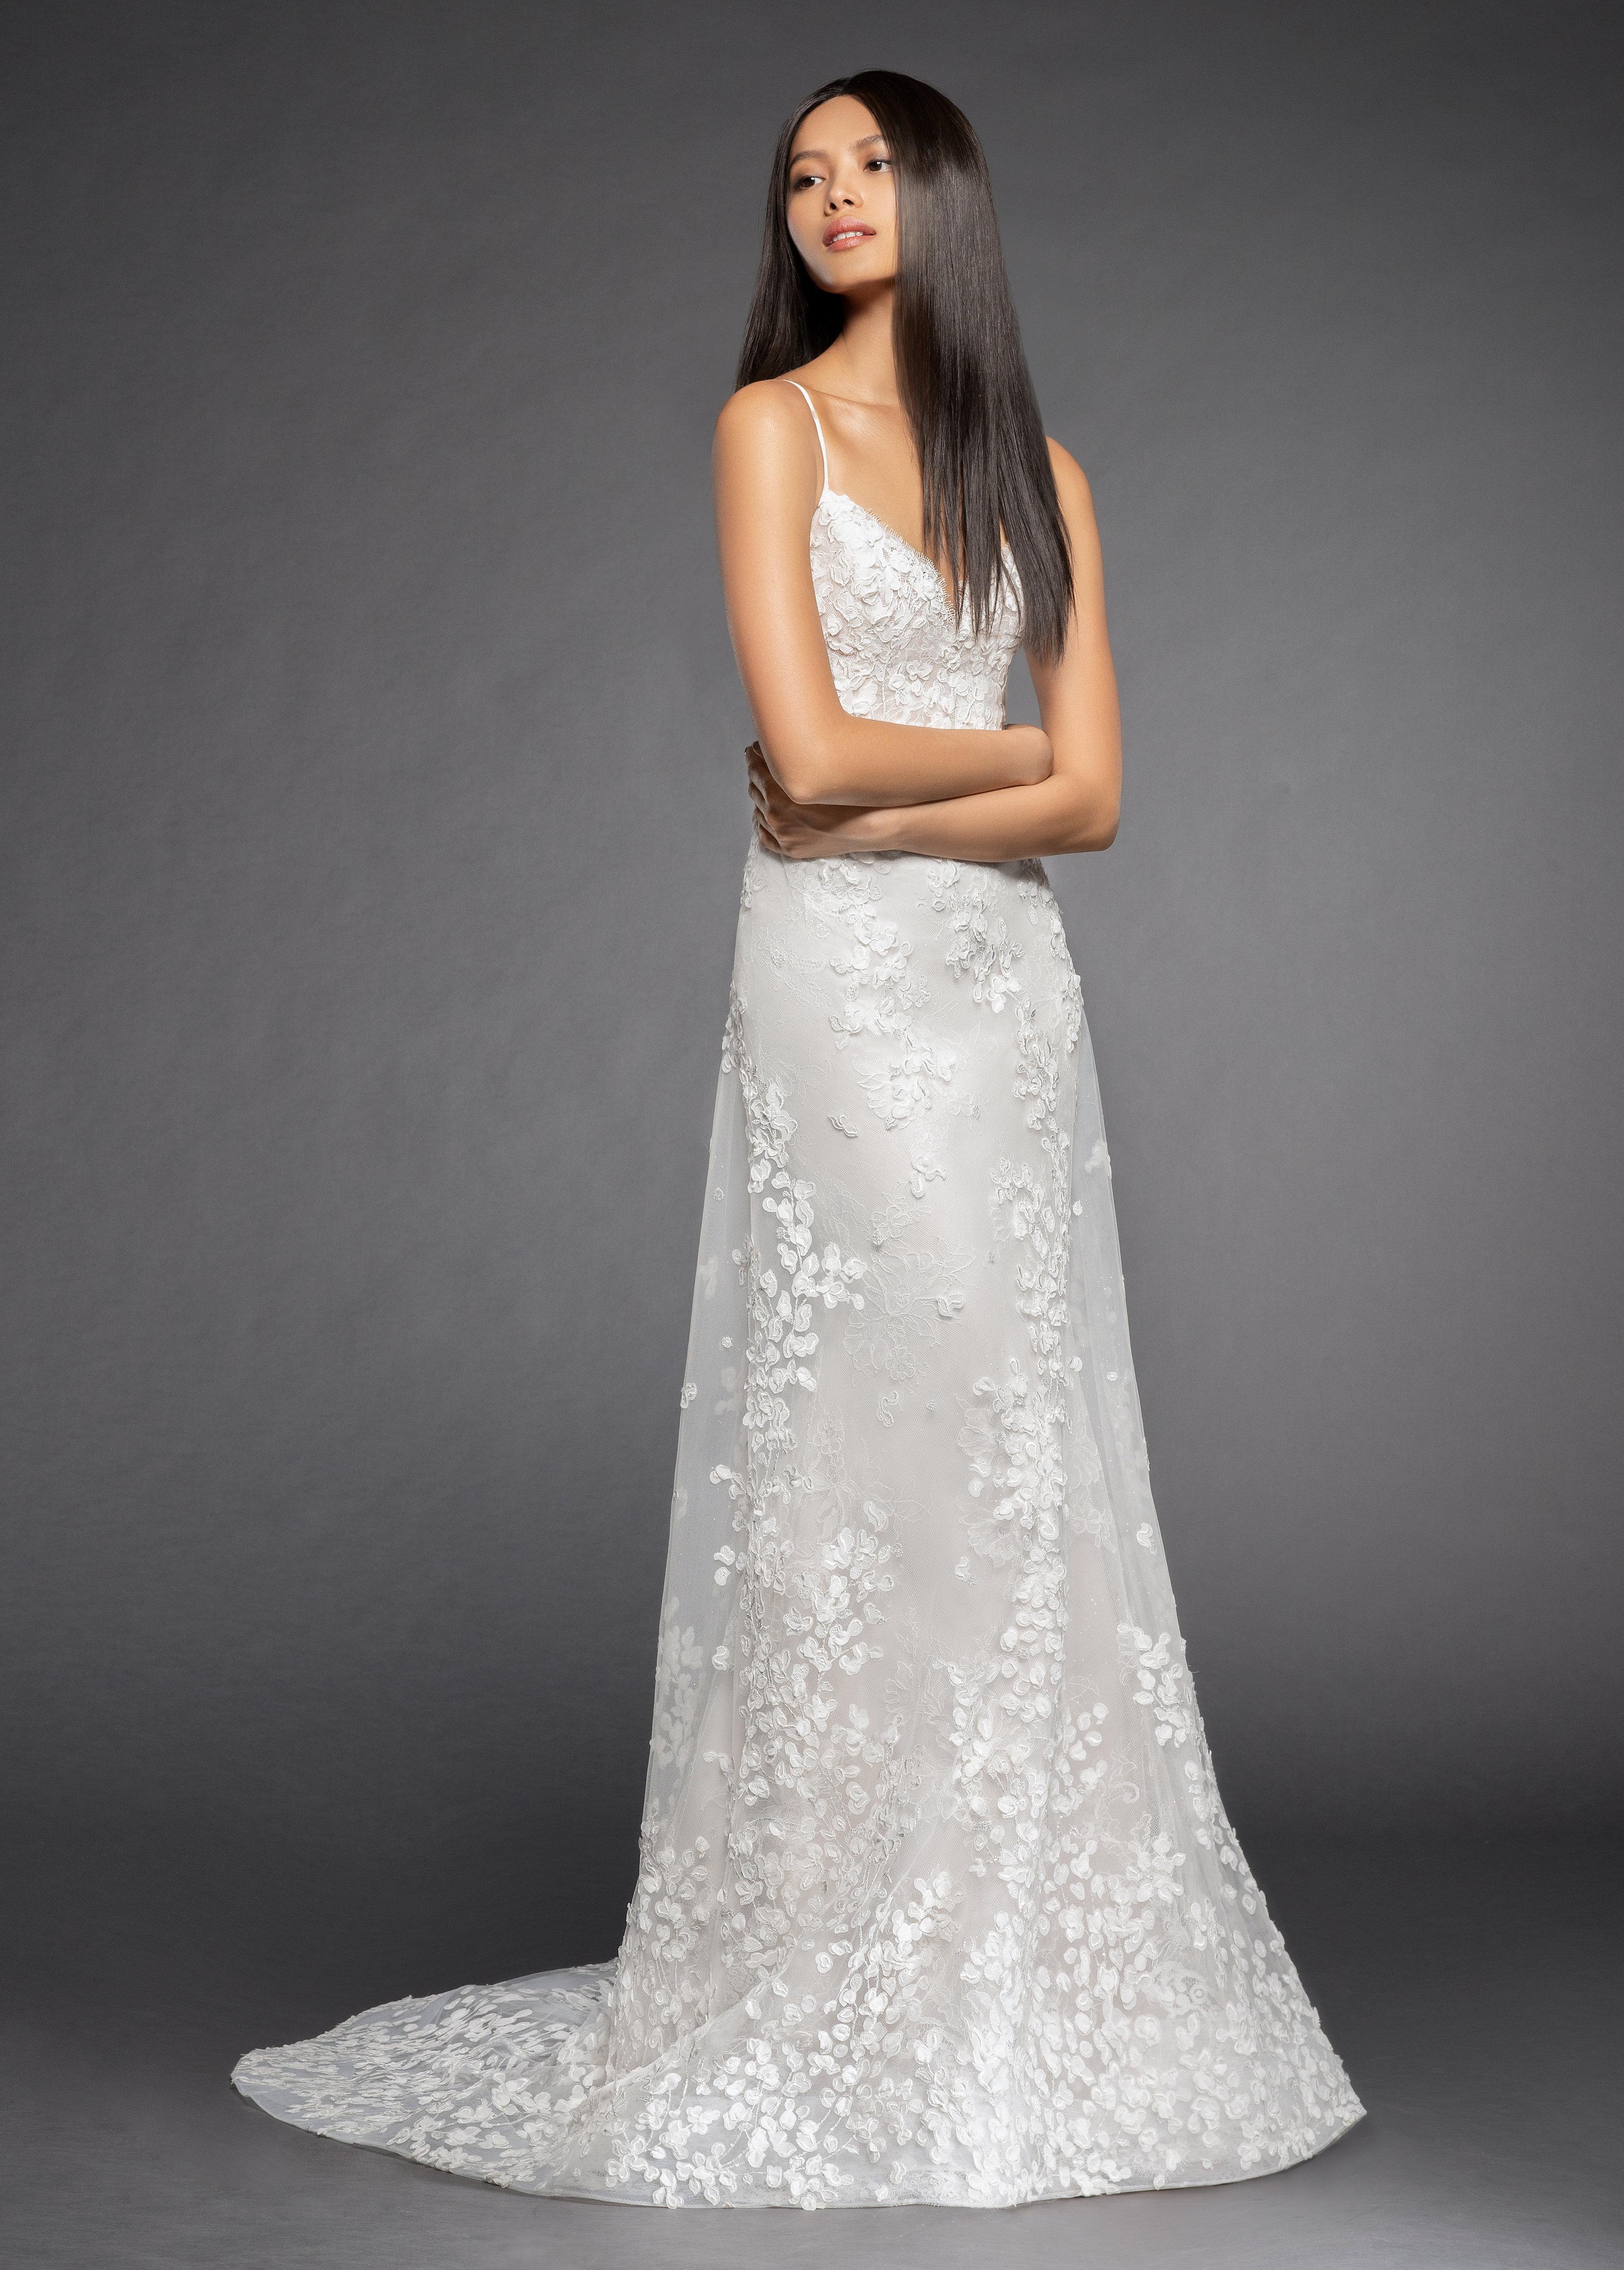 06348f11552 Spaghetti Strap Floral Applique A-line Wedding Dress